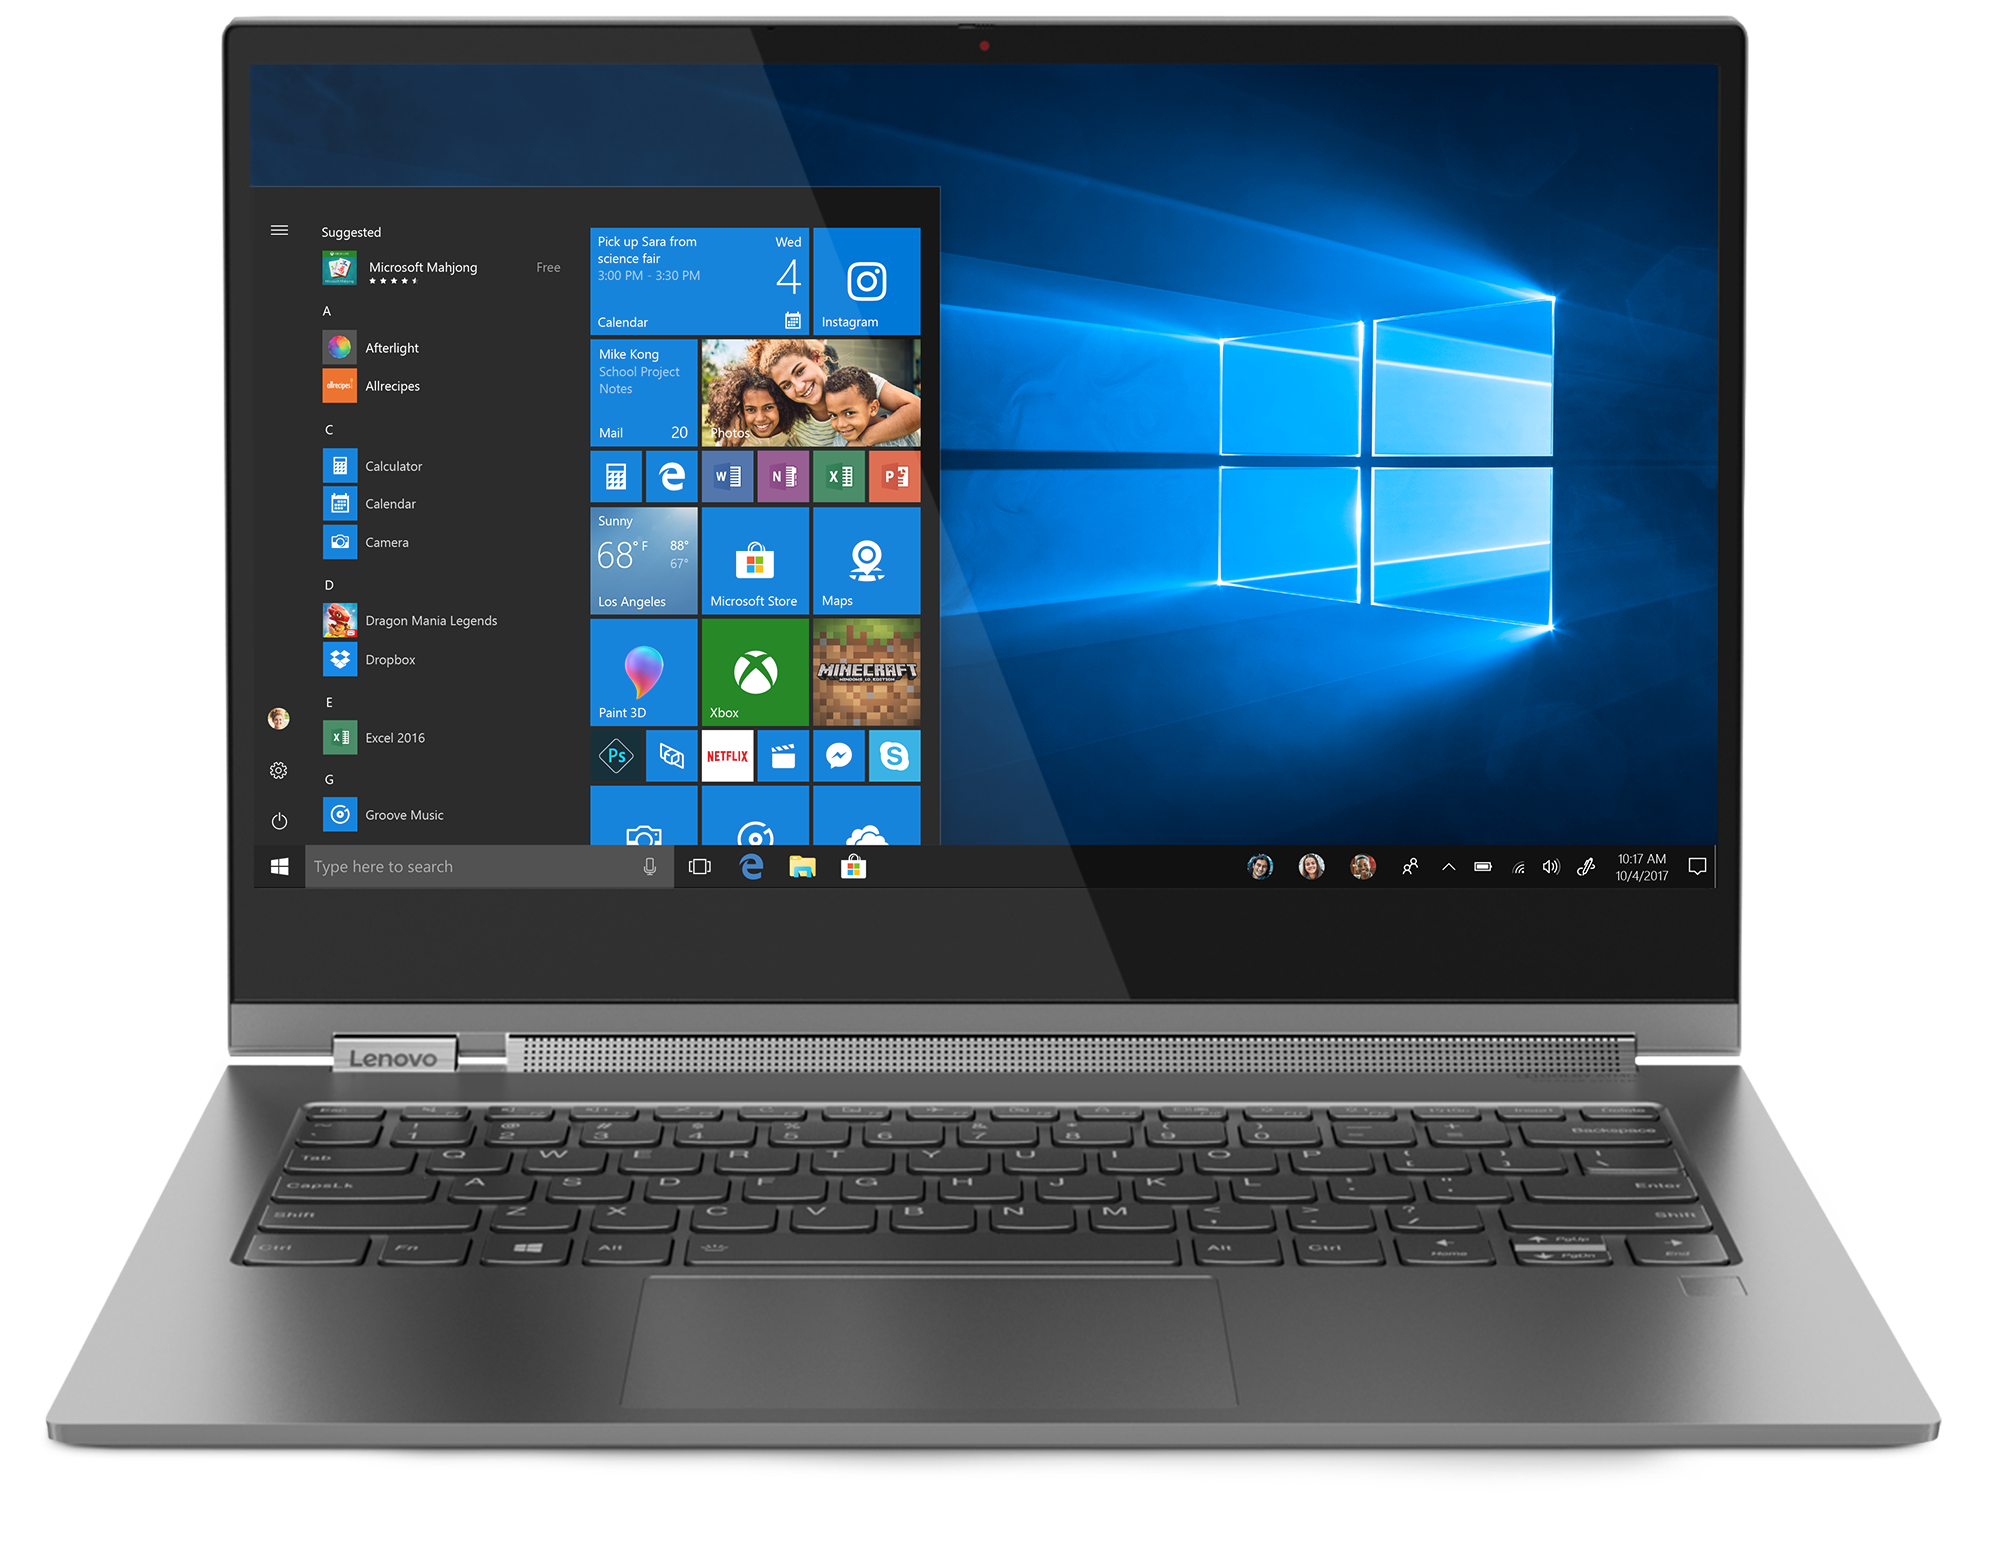 Sale Items Instant Savings Discount Laptop Notebook Powerbank Dell Power Companion 18000mah Pw7015l Company Logo